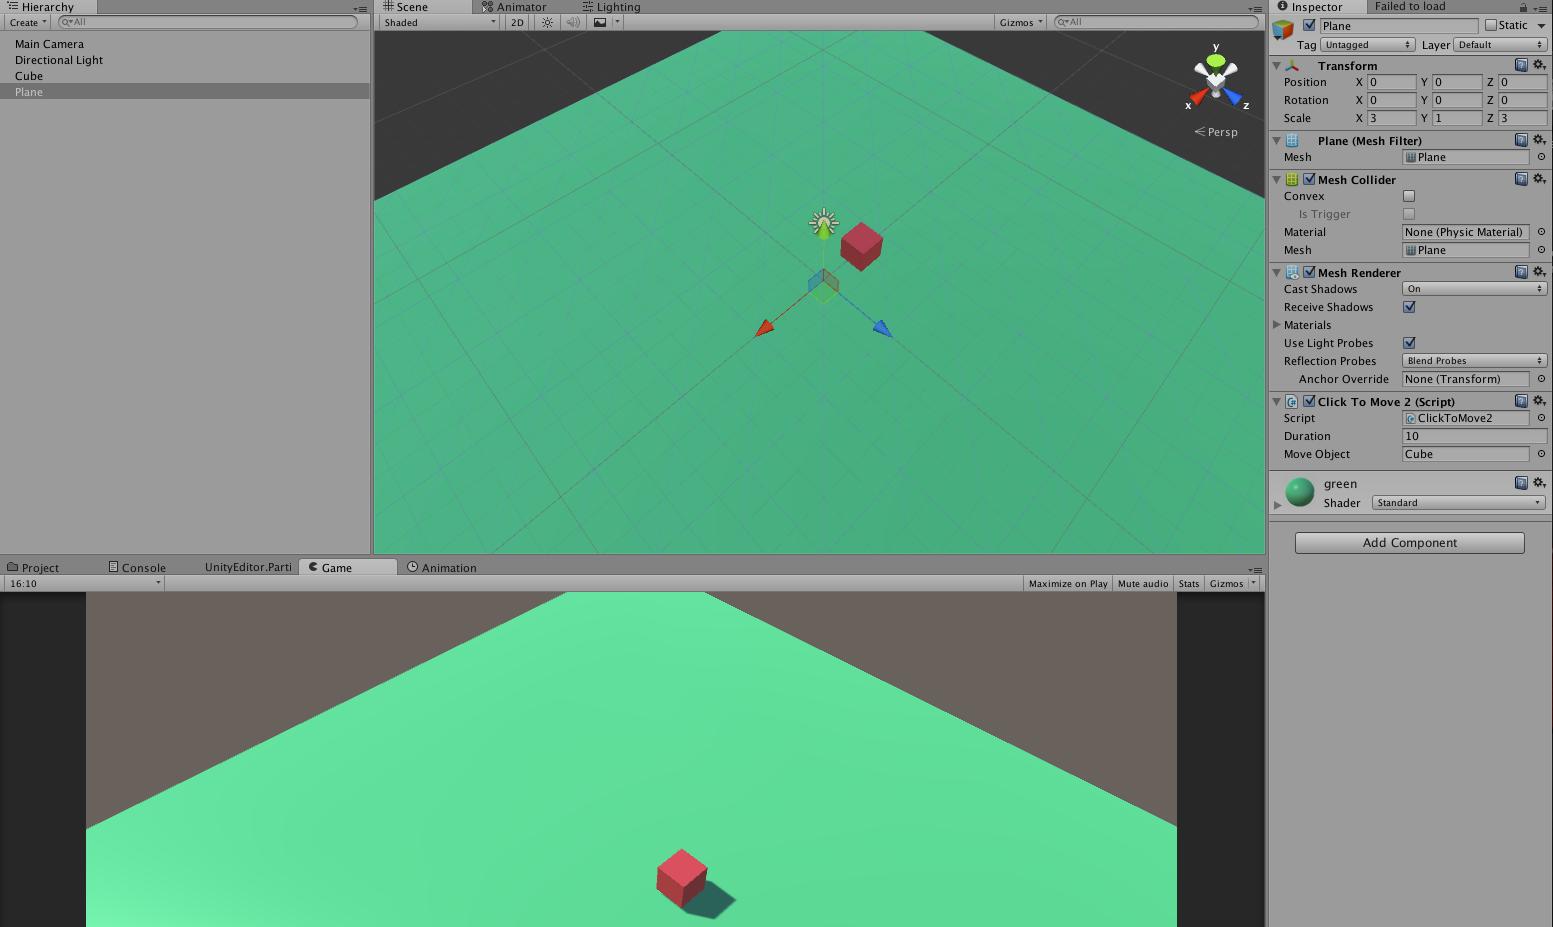 UNITY 3D Tutorials: click to move 3d object using lerp unity c#